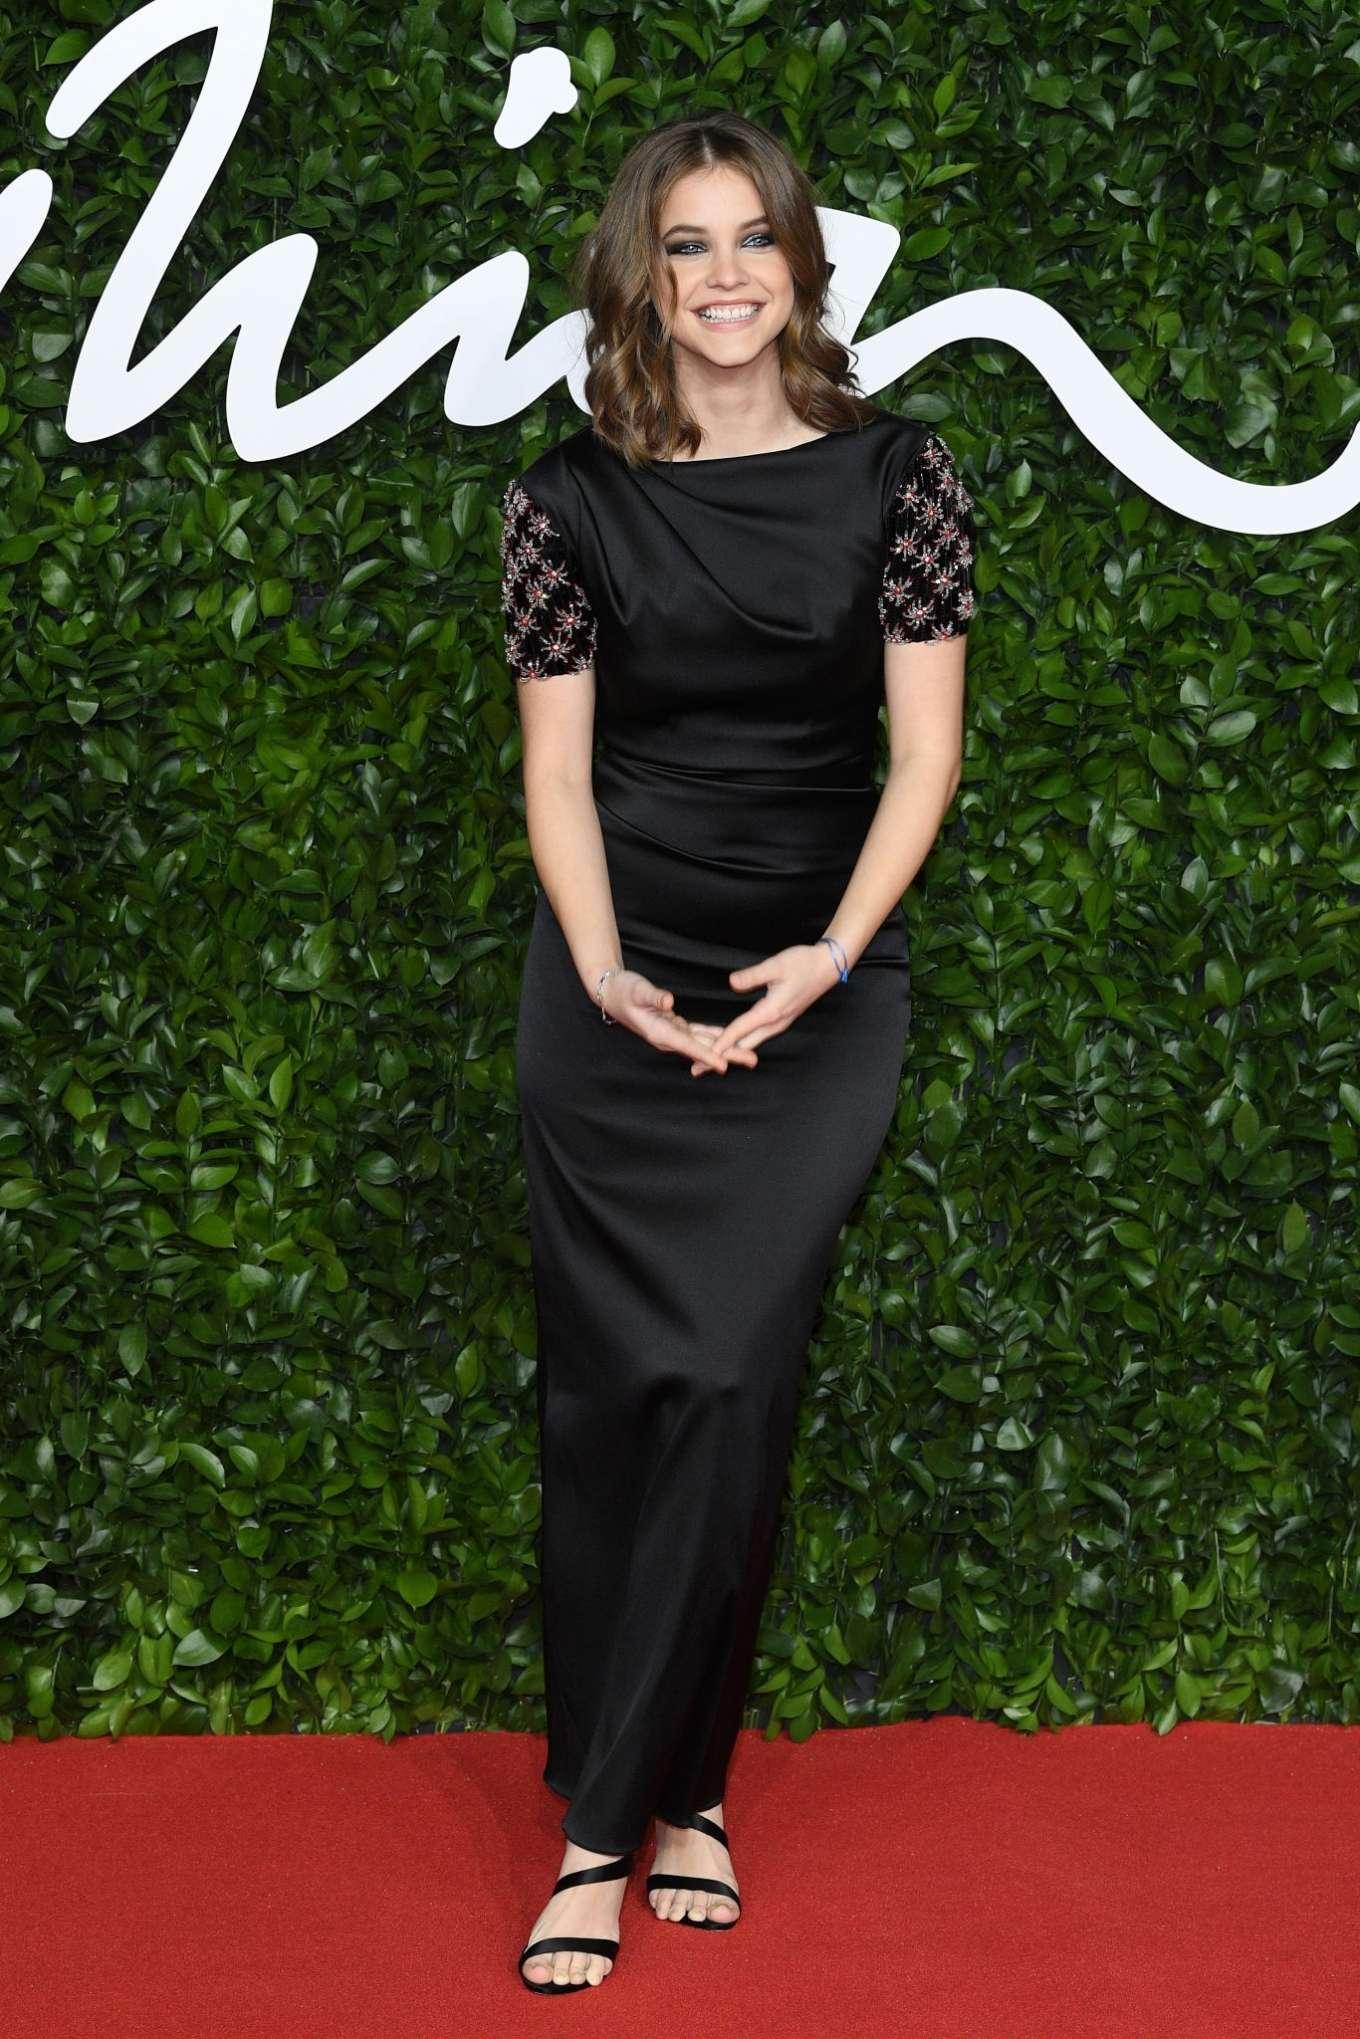 Barbara Palvin 2019 : Barbara Palvin – Fashion Awards 2019 in London-15